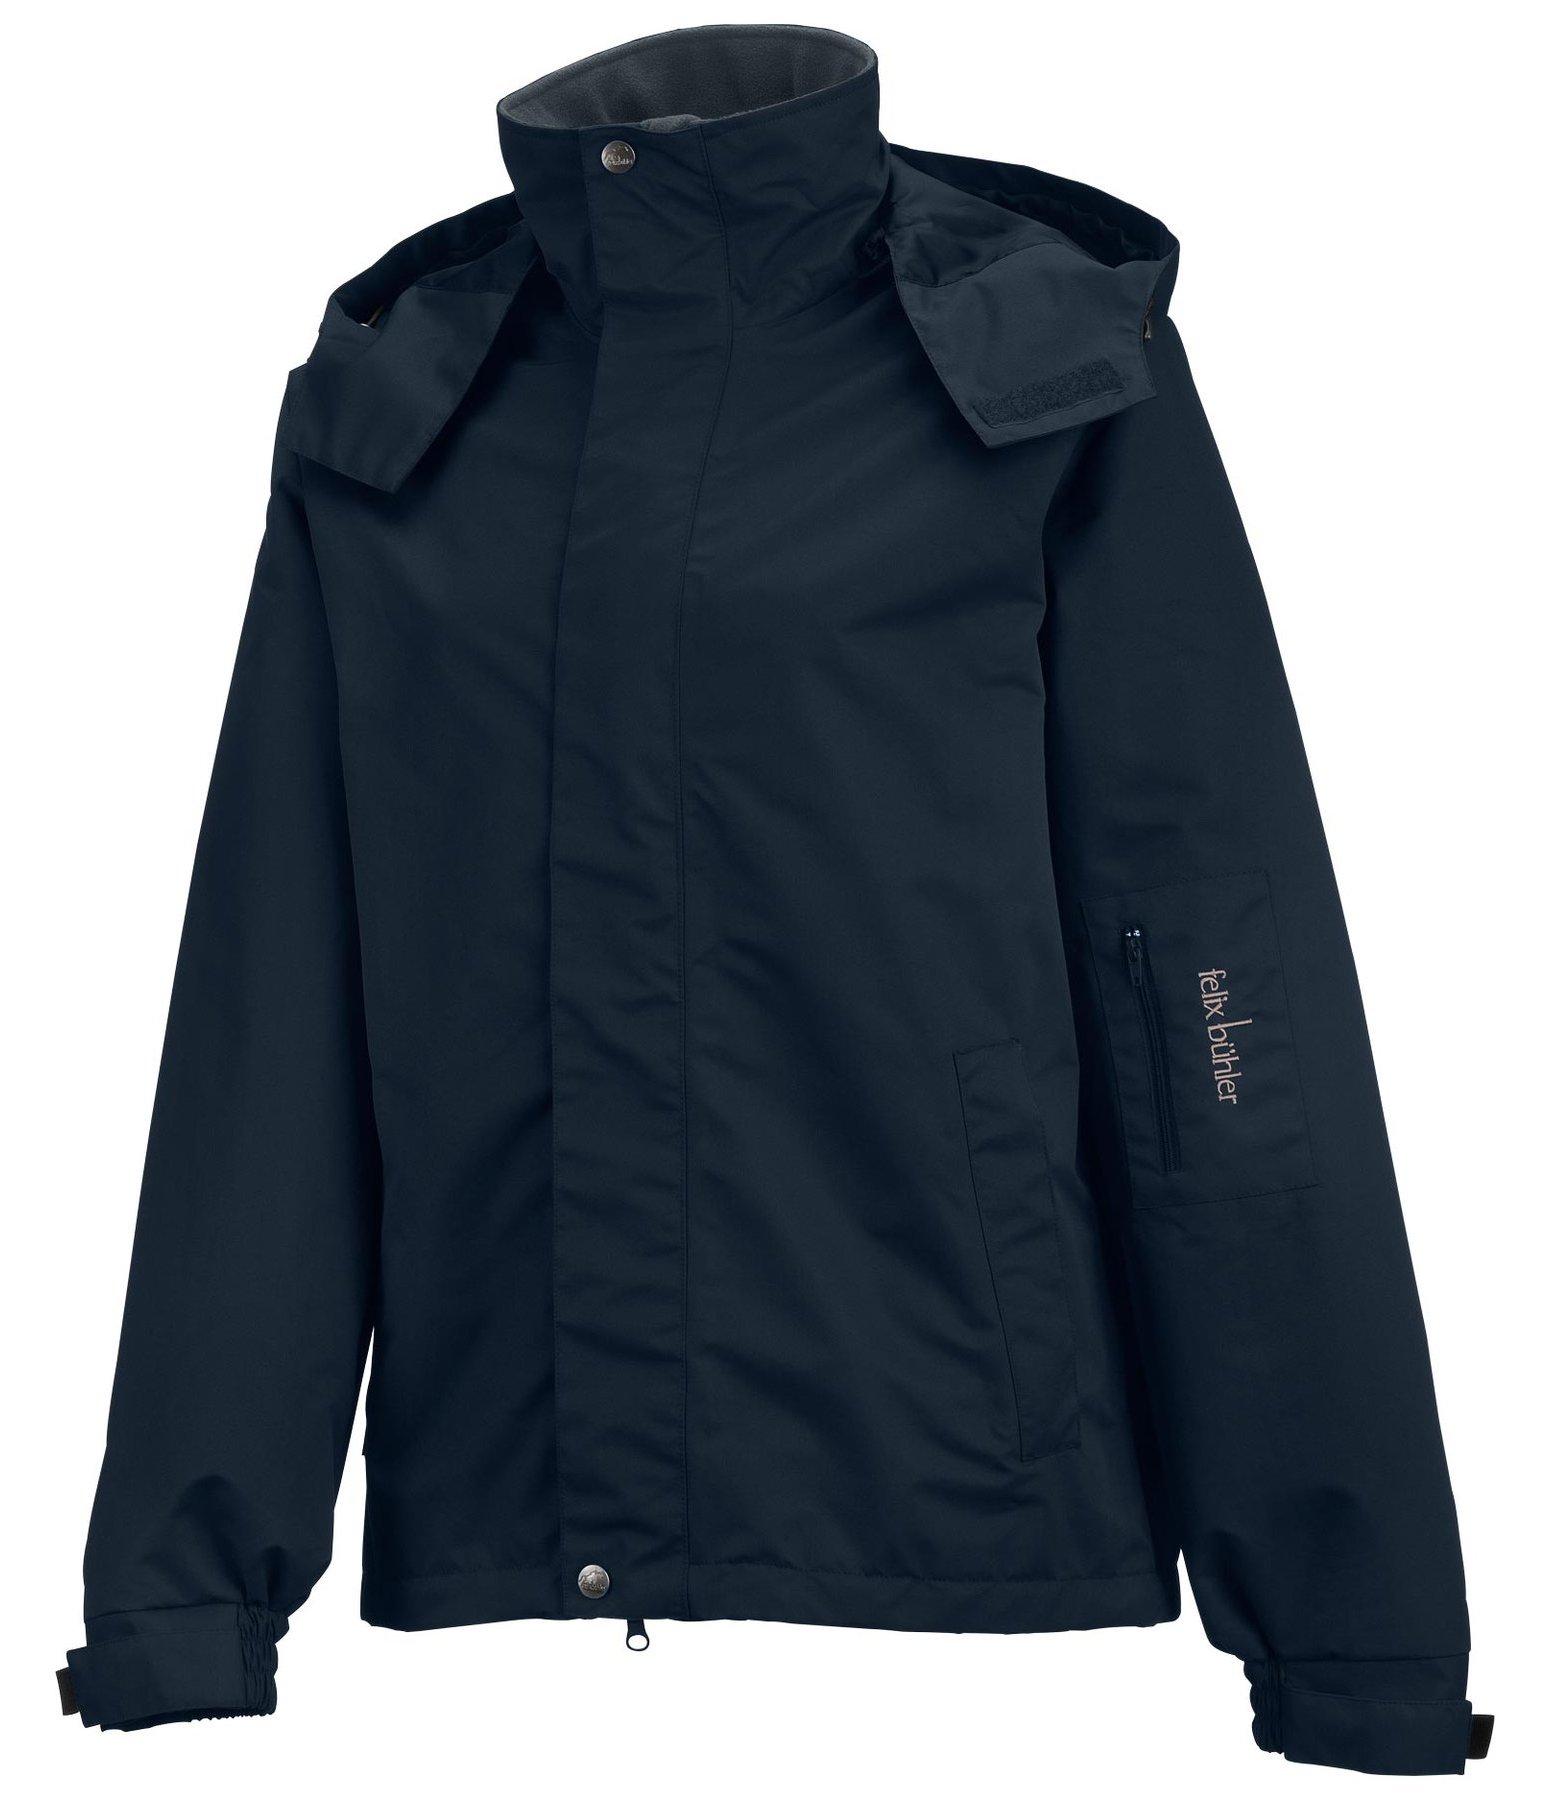 functional riding jacket spirit winter riding jackets. Black Bedroom Furniture Sets. Home Design Ideas